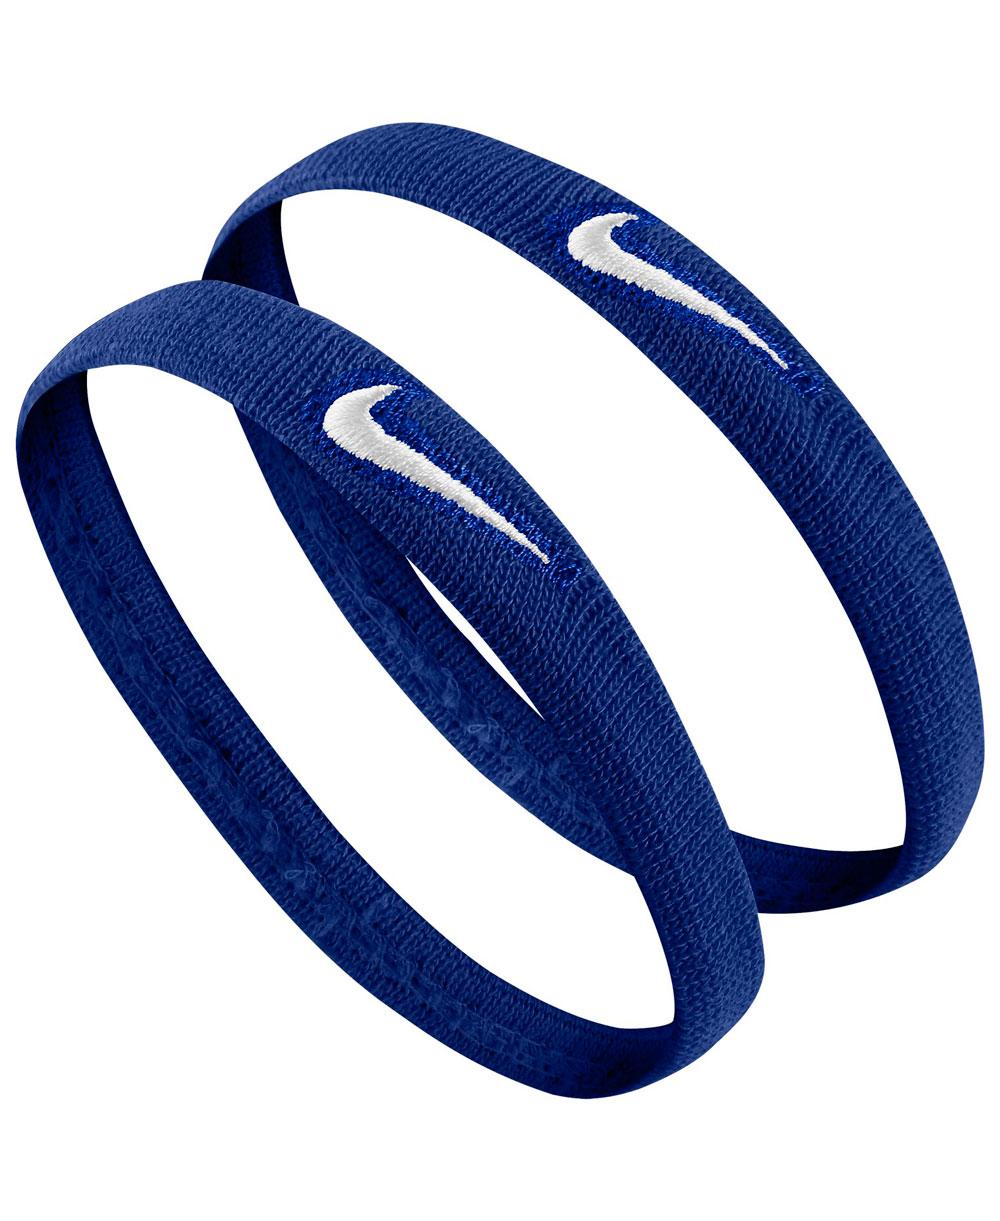 Dri-FIT Skinny Bandes Avant-bras Blue